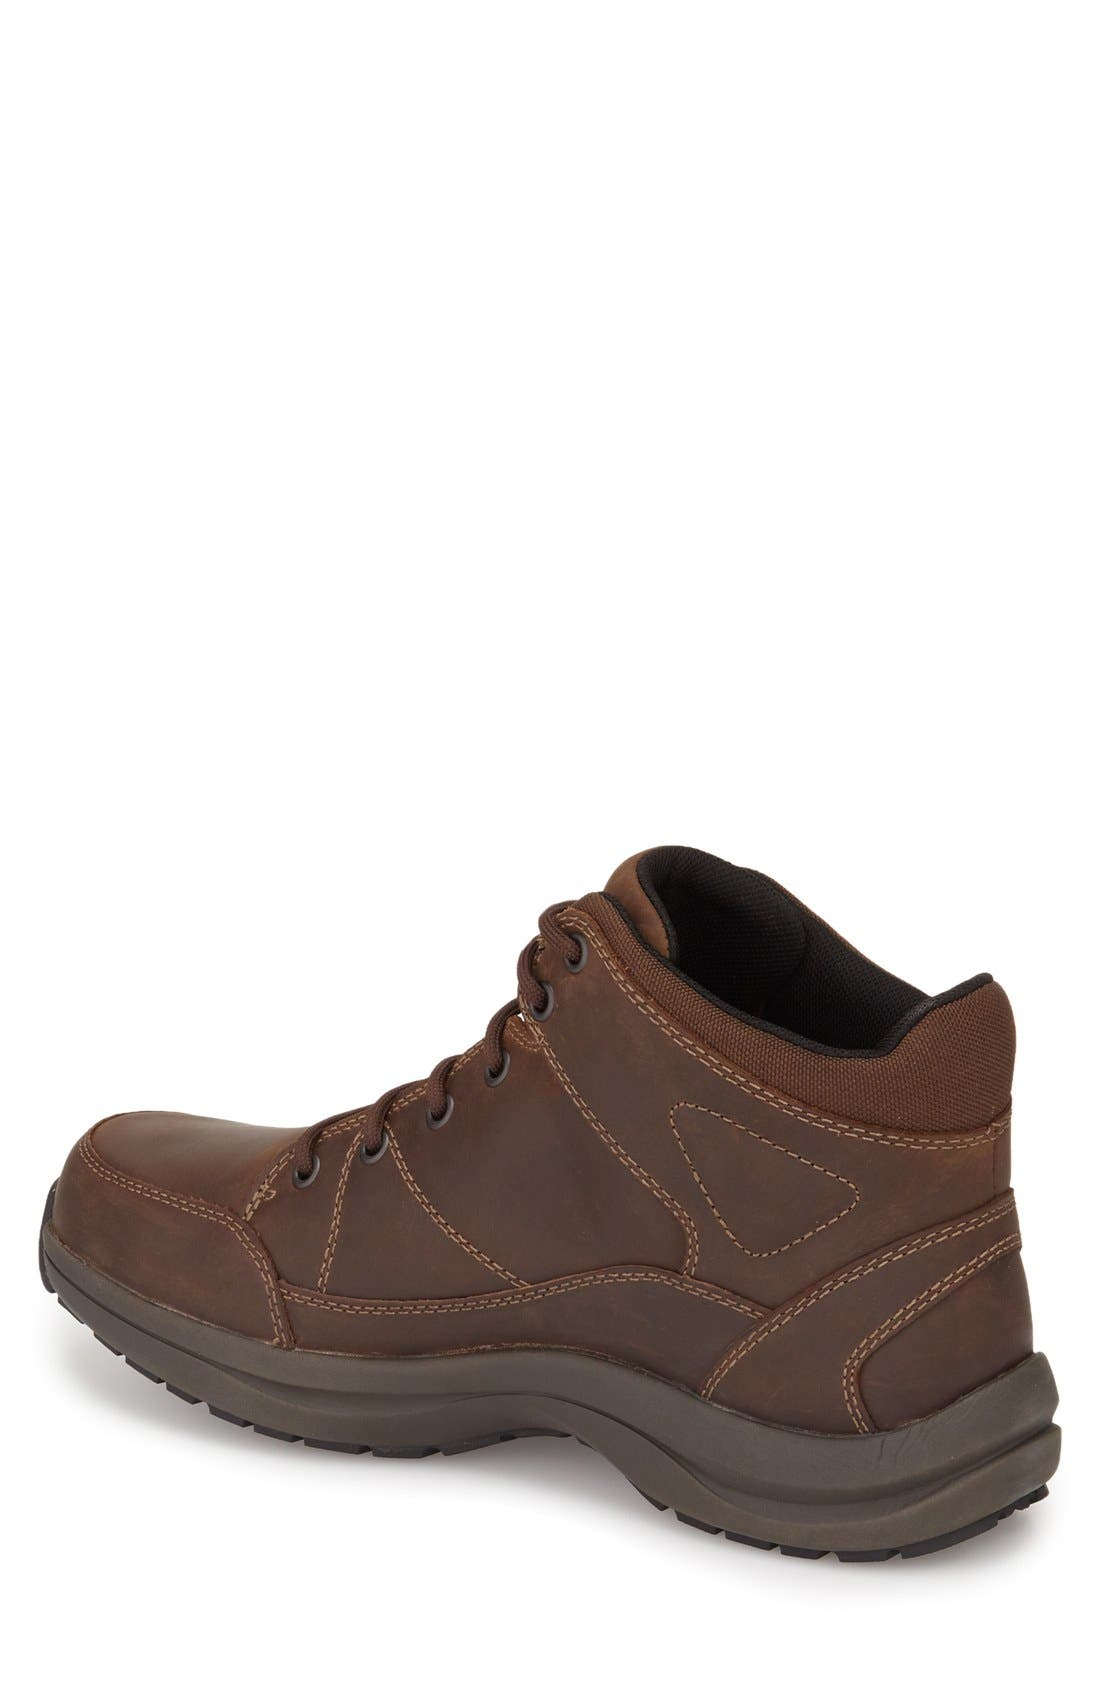 Alternate Image 2  - Dunham Simon-Dun Waterproof Boot (Men)